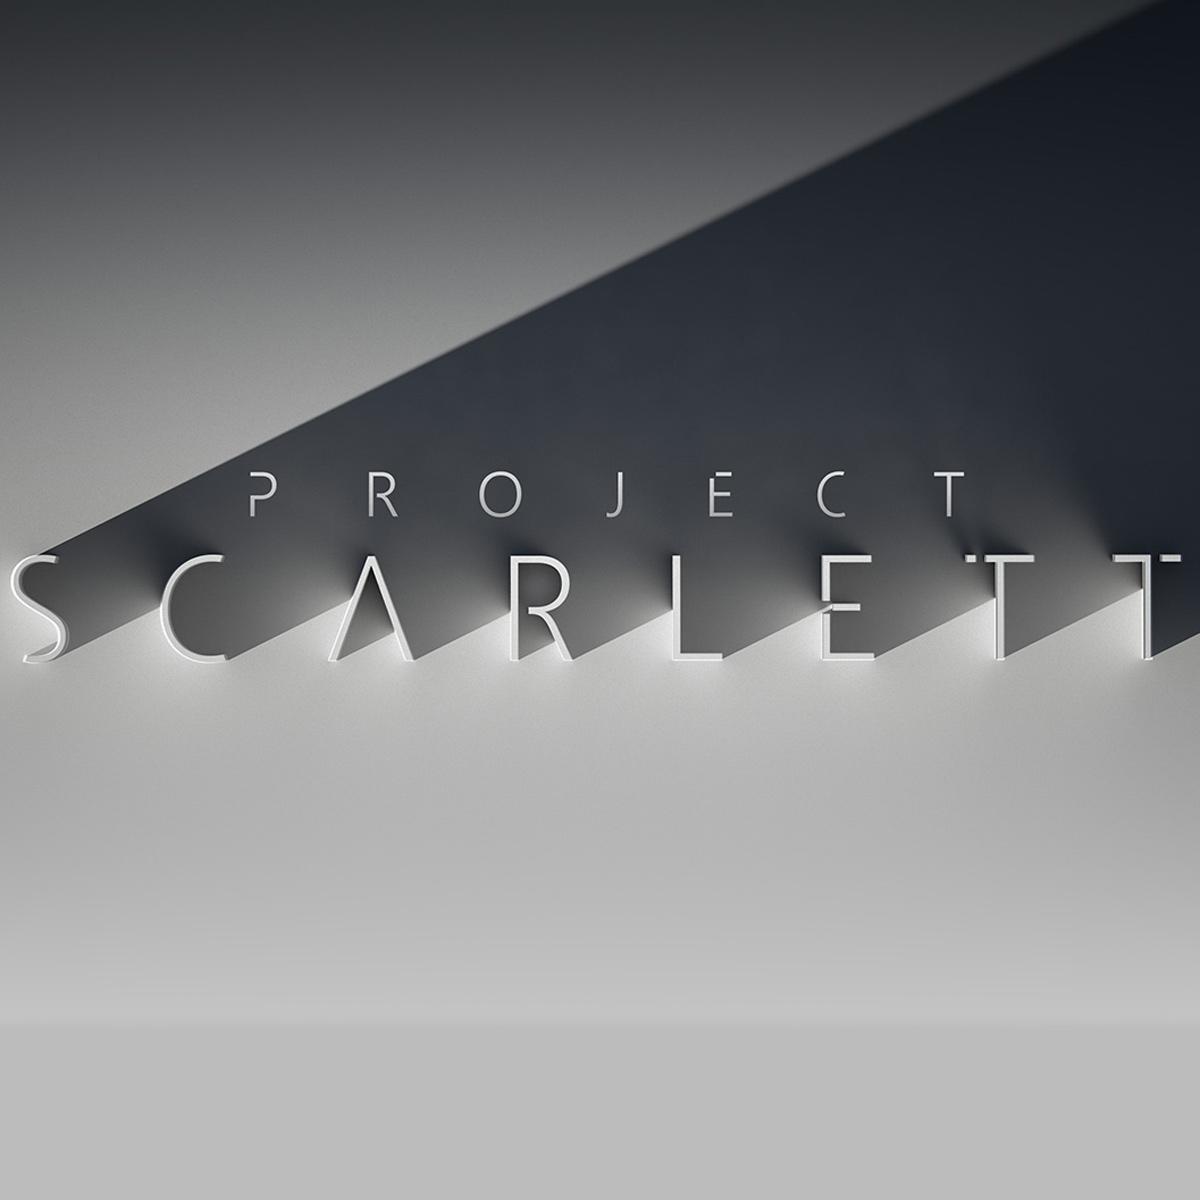 8K/120fps&SSD搭載の次世代Xbox「Project Scarlett」が2020年に発売